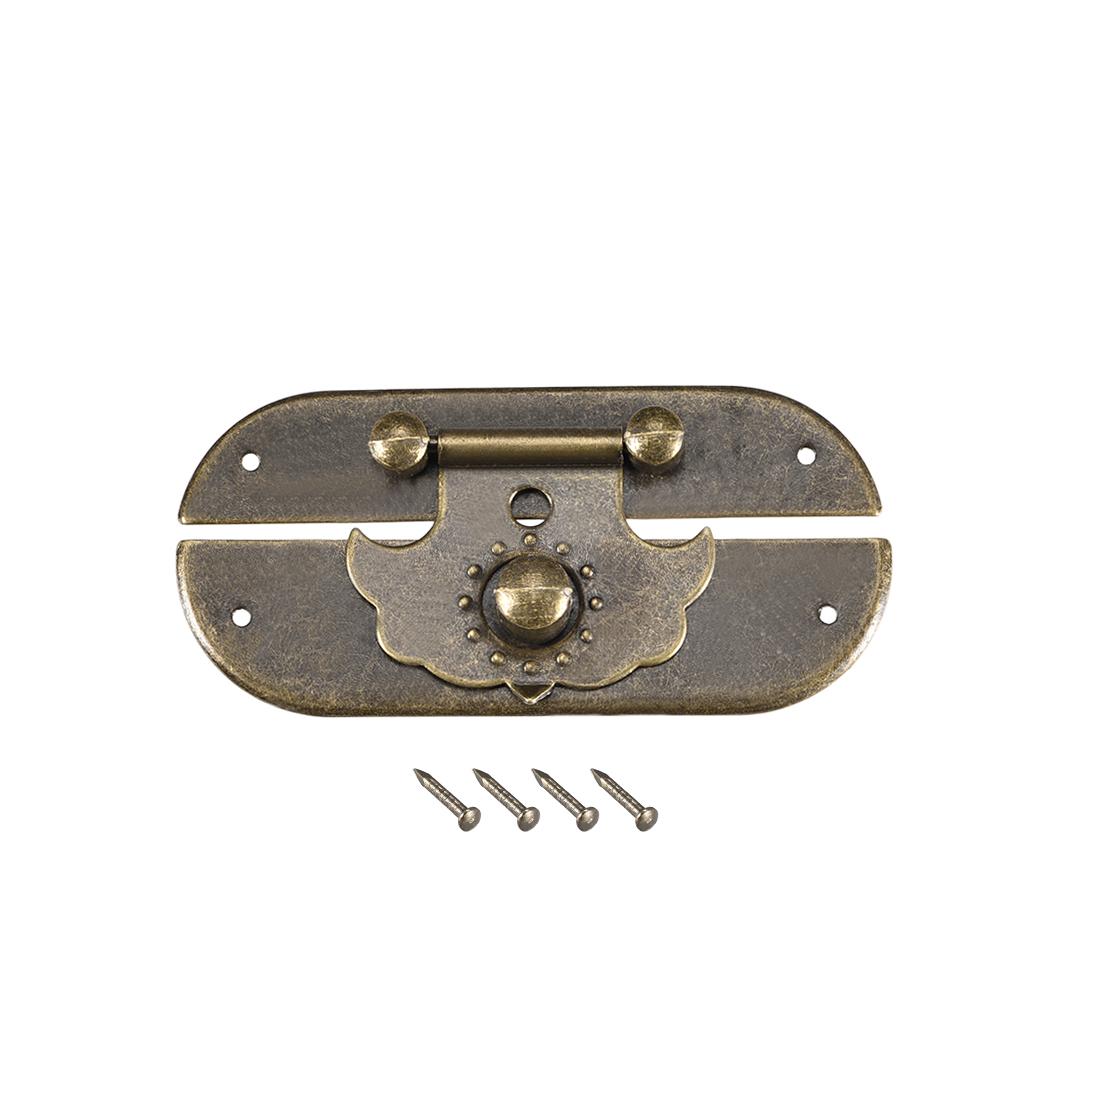 Wood Case Box Hasp 66x30mm Closure Antique Latches Bronze Tone, 5 Pcs